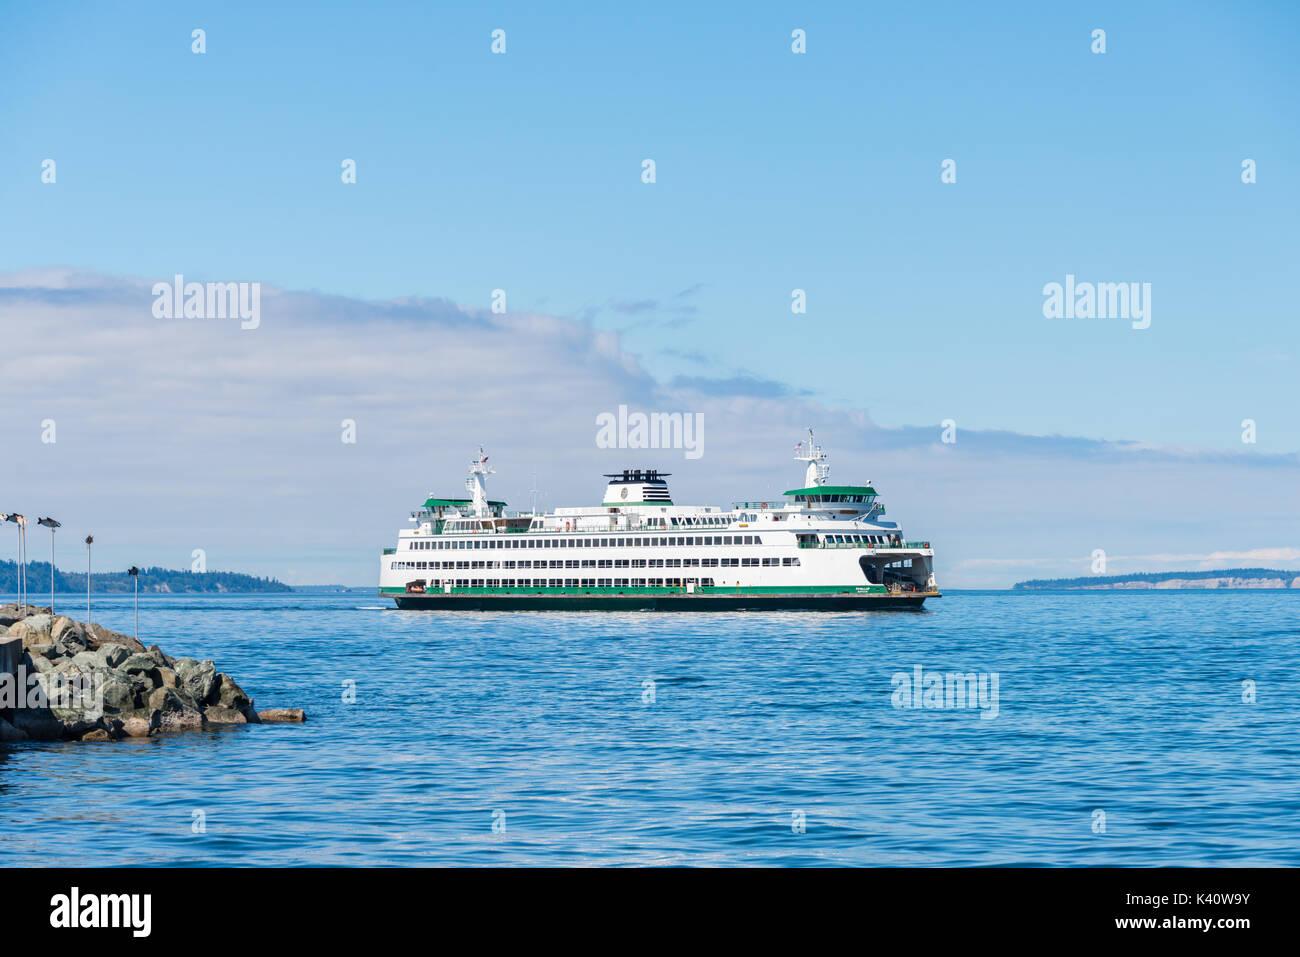 Washington State Ferry Puyallup Coming into Port, Edmonds, Washington - Stock Image